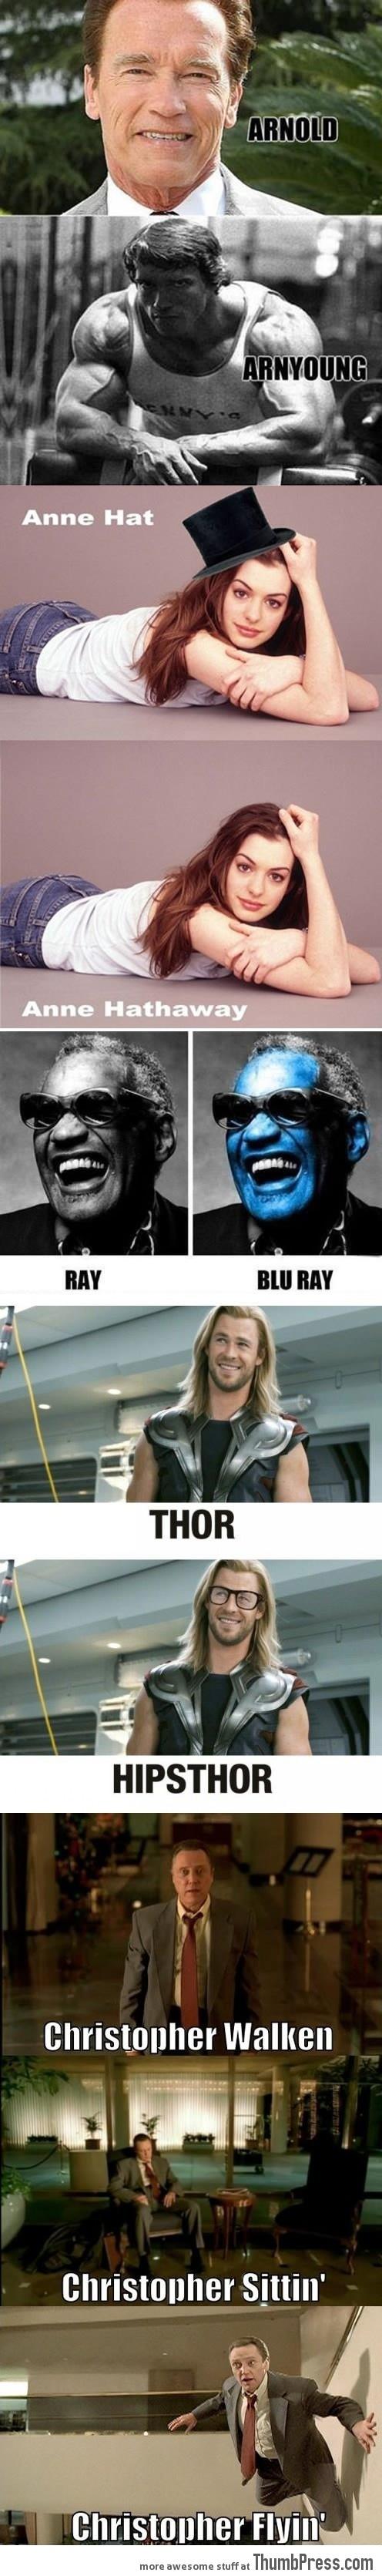 Just a compilation of celebrity puns